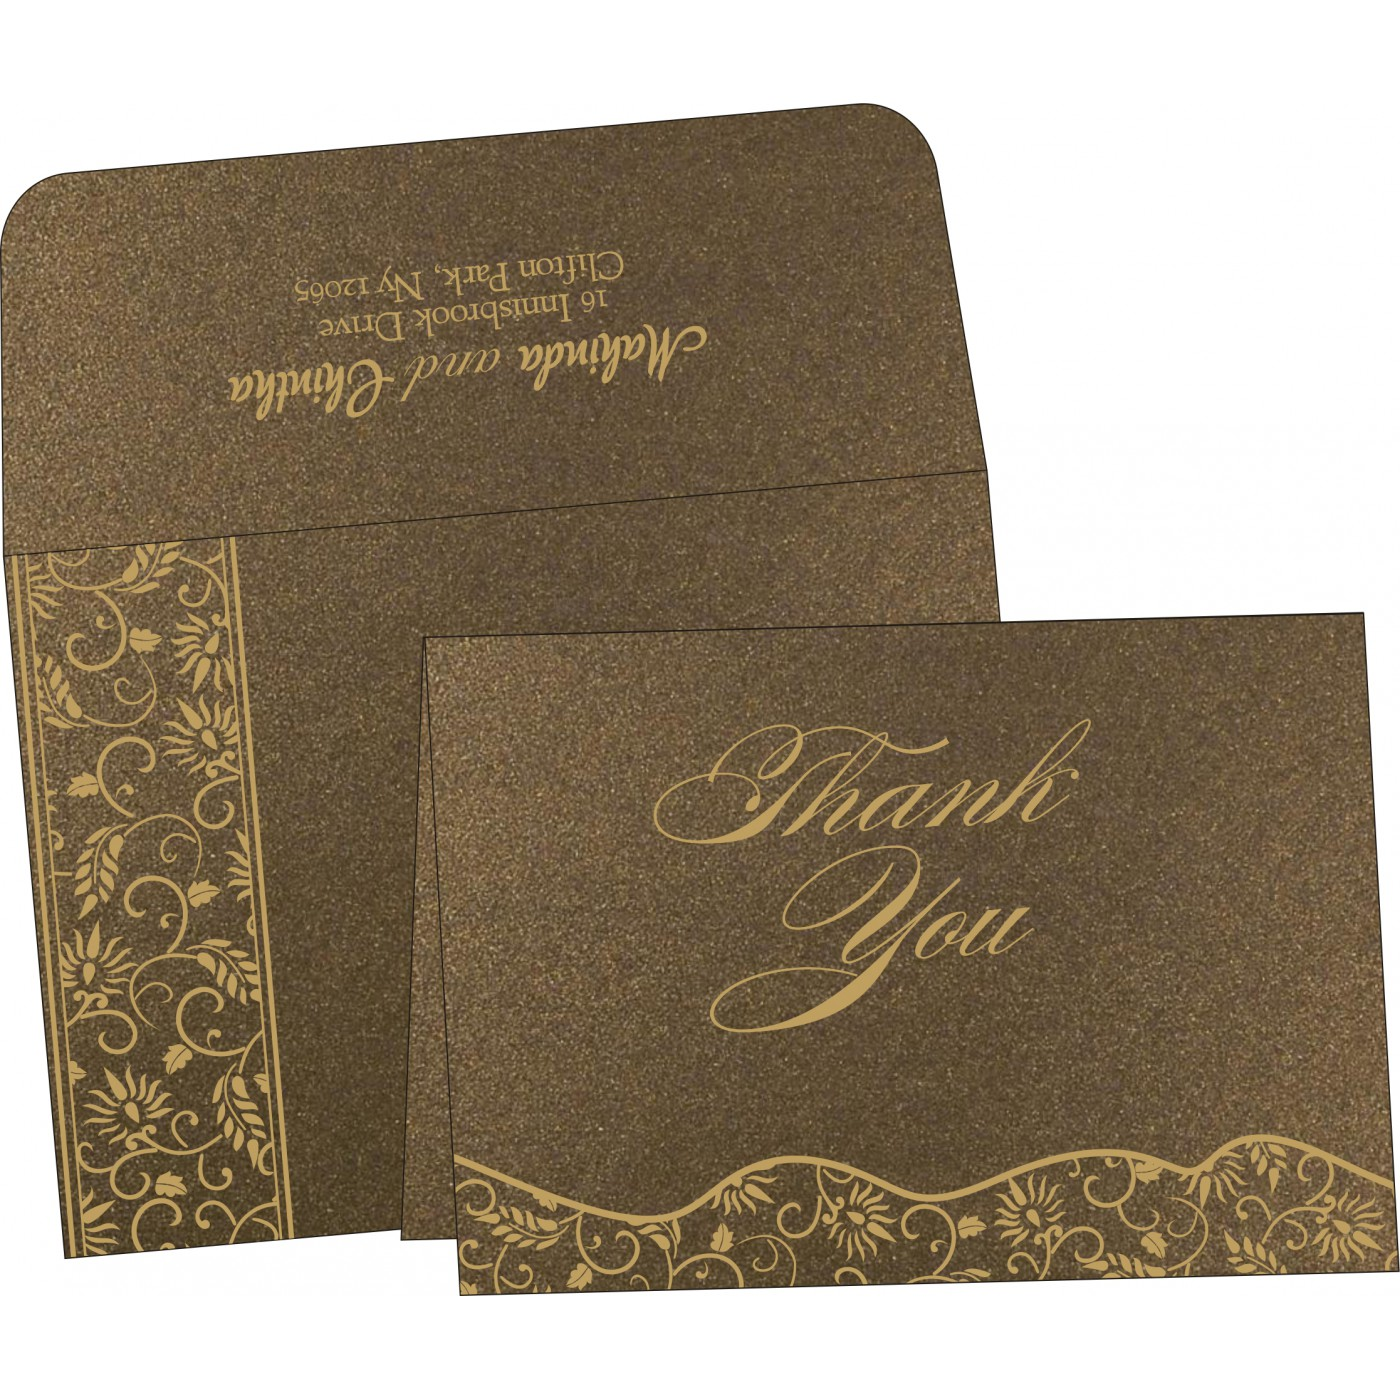 Thank You Cards : TYC-8236I - 123WeddingCards